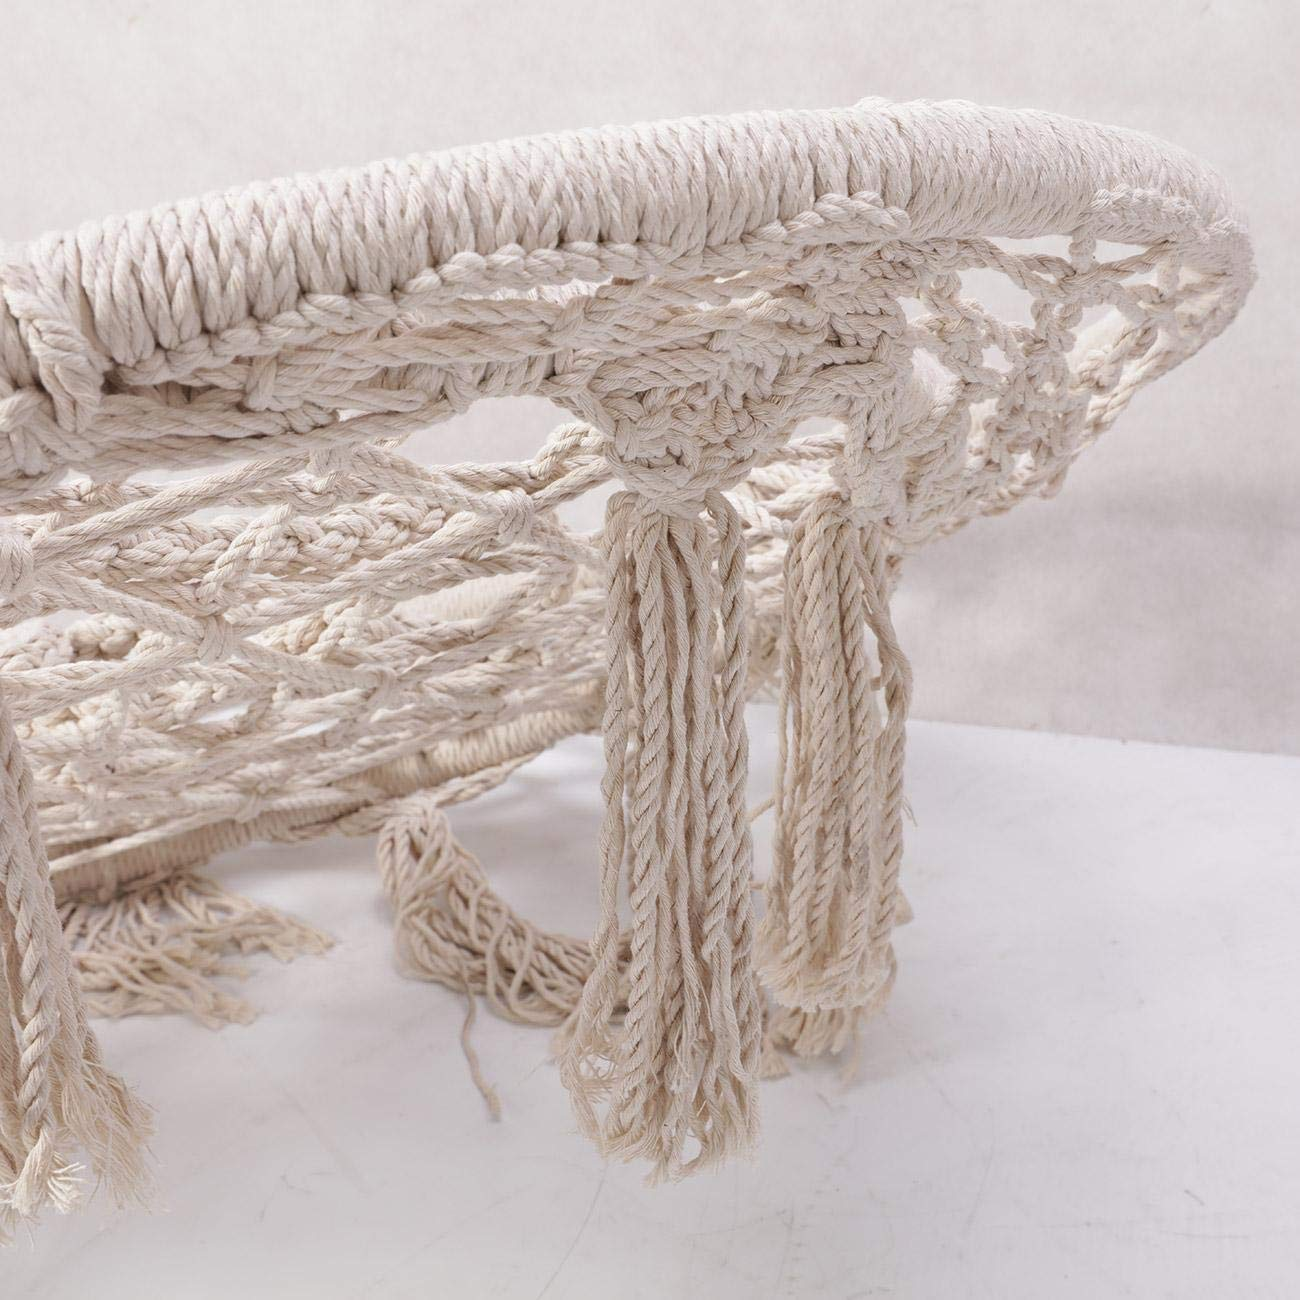 BEAMNOVA 265 lbs Capacity Hammock Chair with Hanging Hardware for Indoor Outdoor Beige by BEAMNOVA (Image #7)